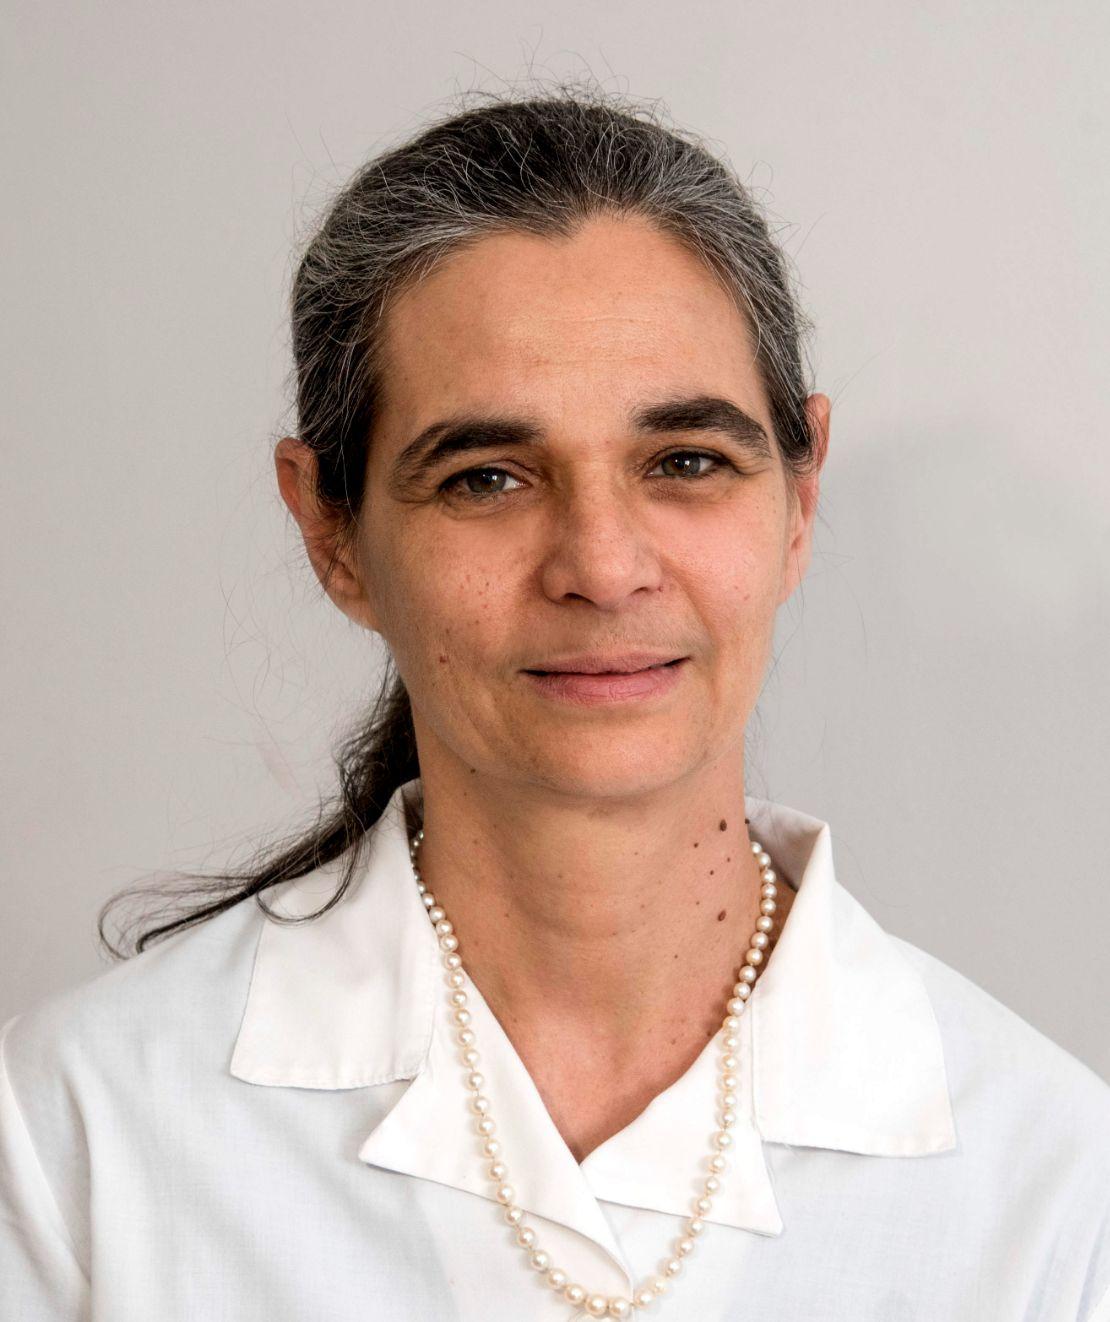 Micaela Montalto